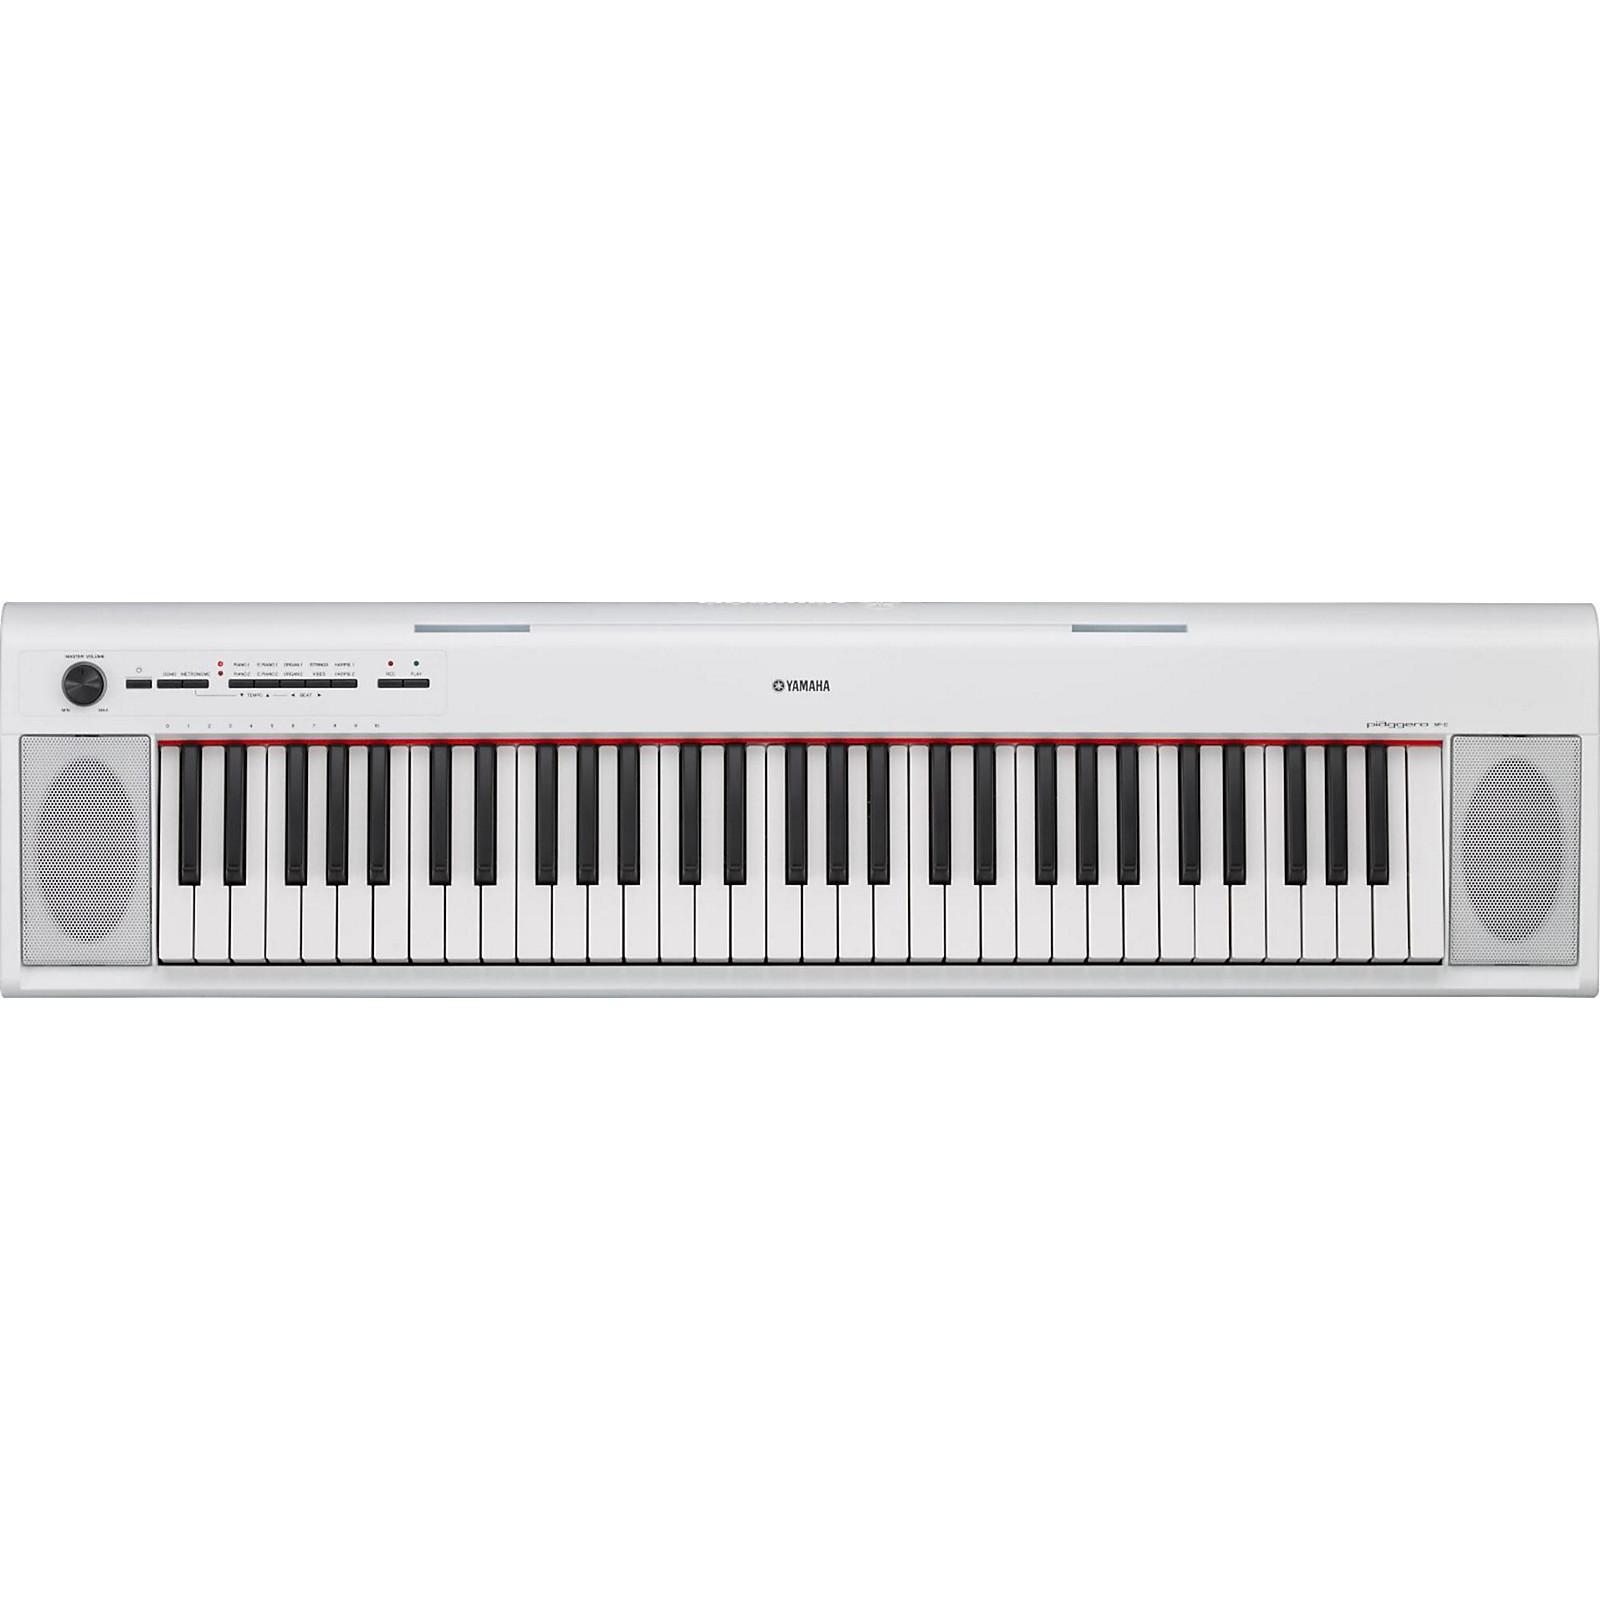 Yamaha NP12 61-Key Entry-Level Piaggero Ultra-Portable Digital Piano